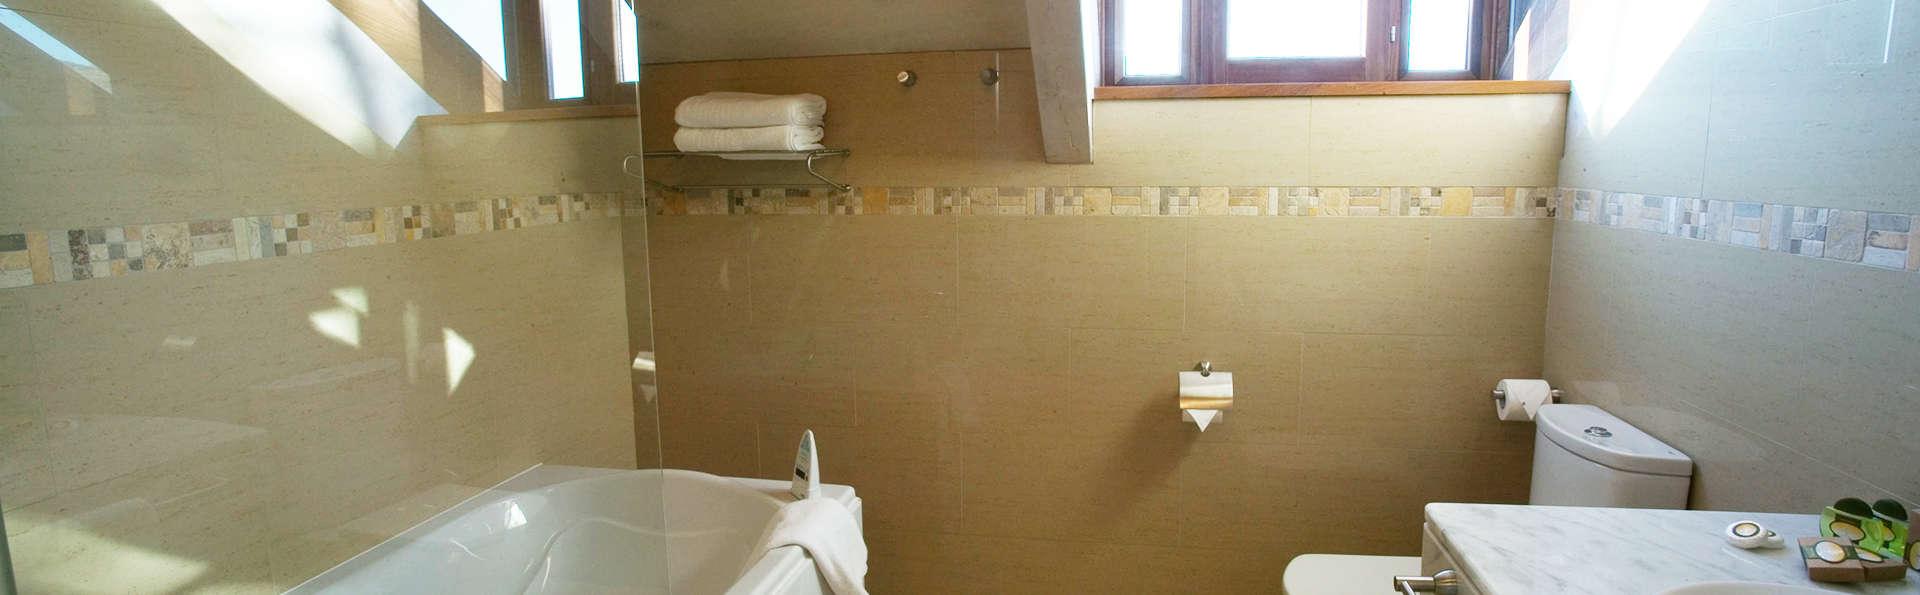 Hotel de Floriana - EDIT_bath.jpg